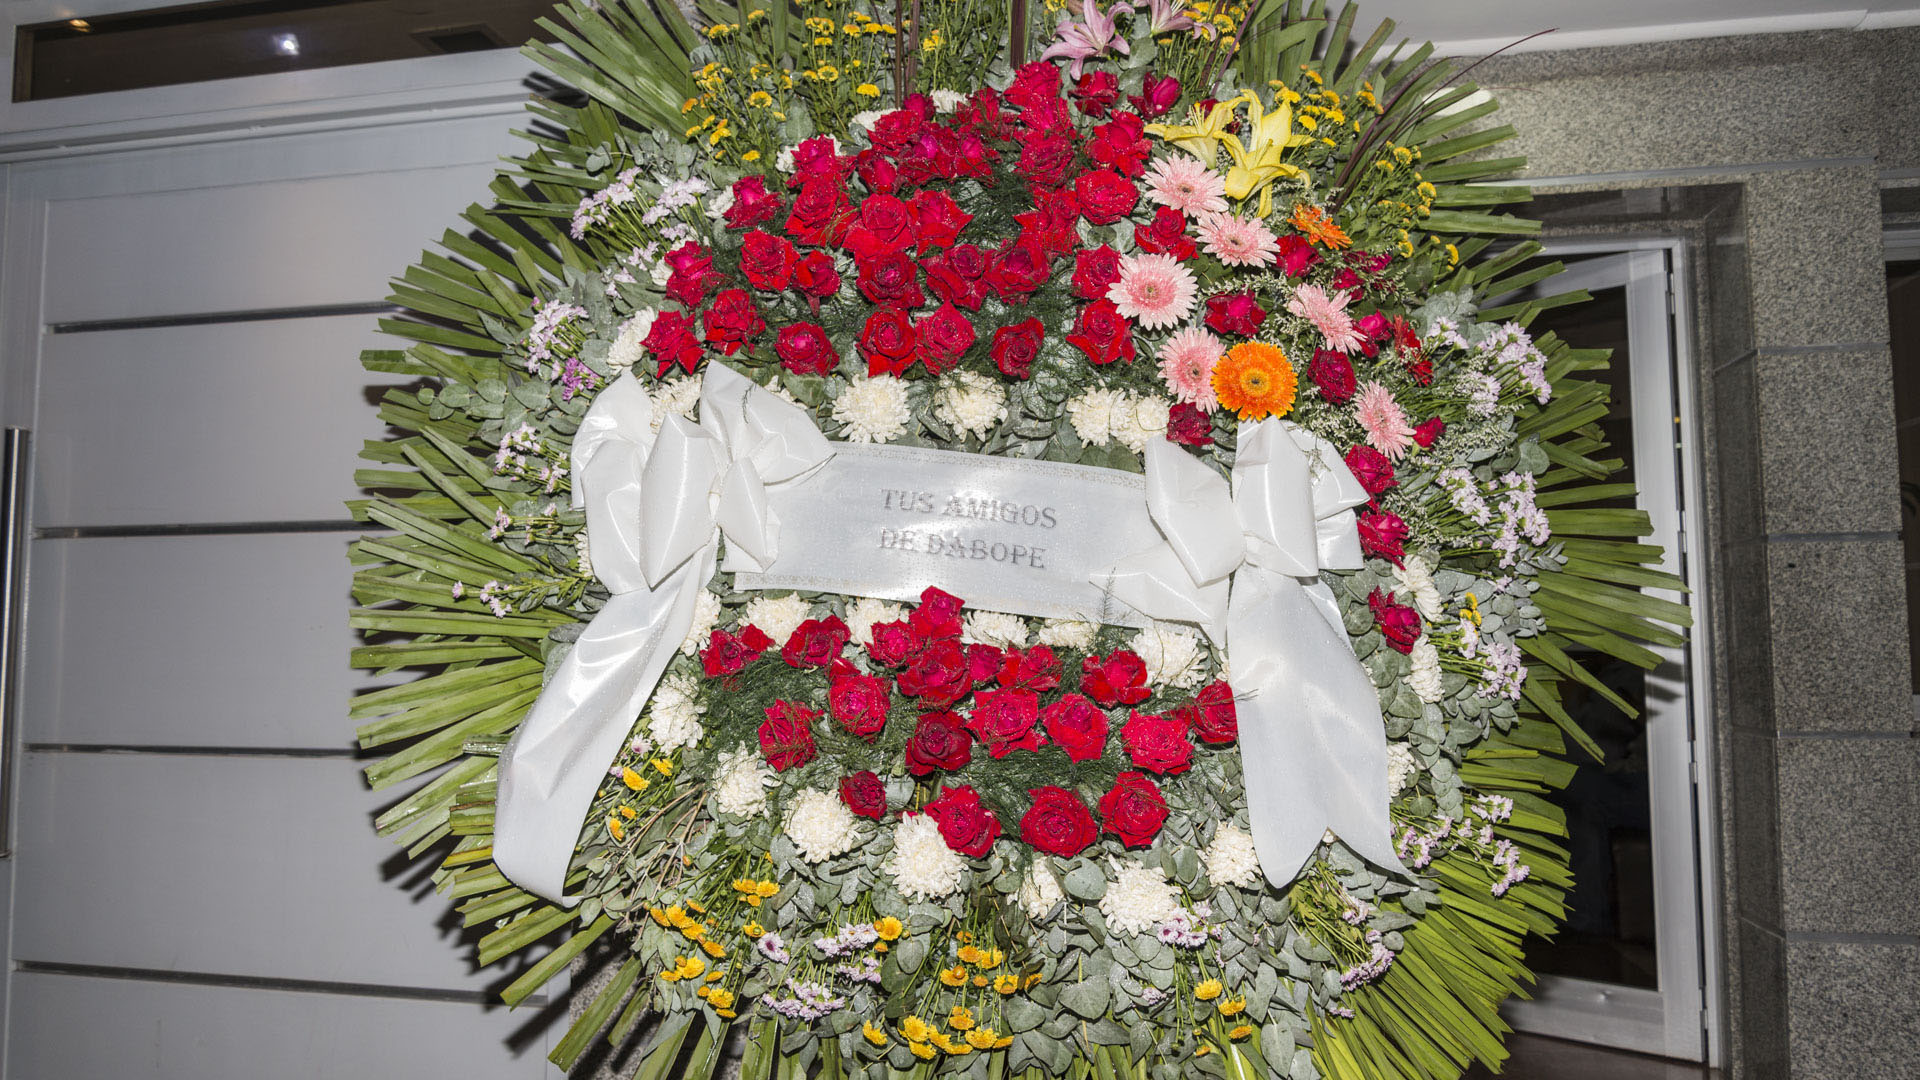 La corona funebre enviada por Dabope